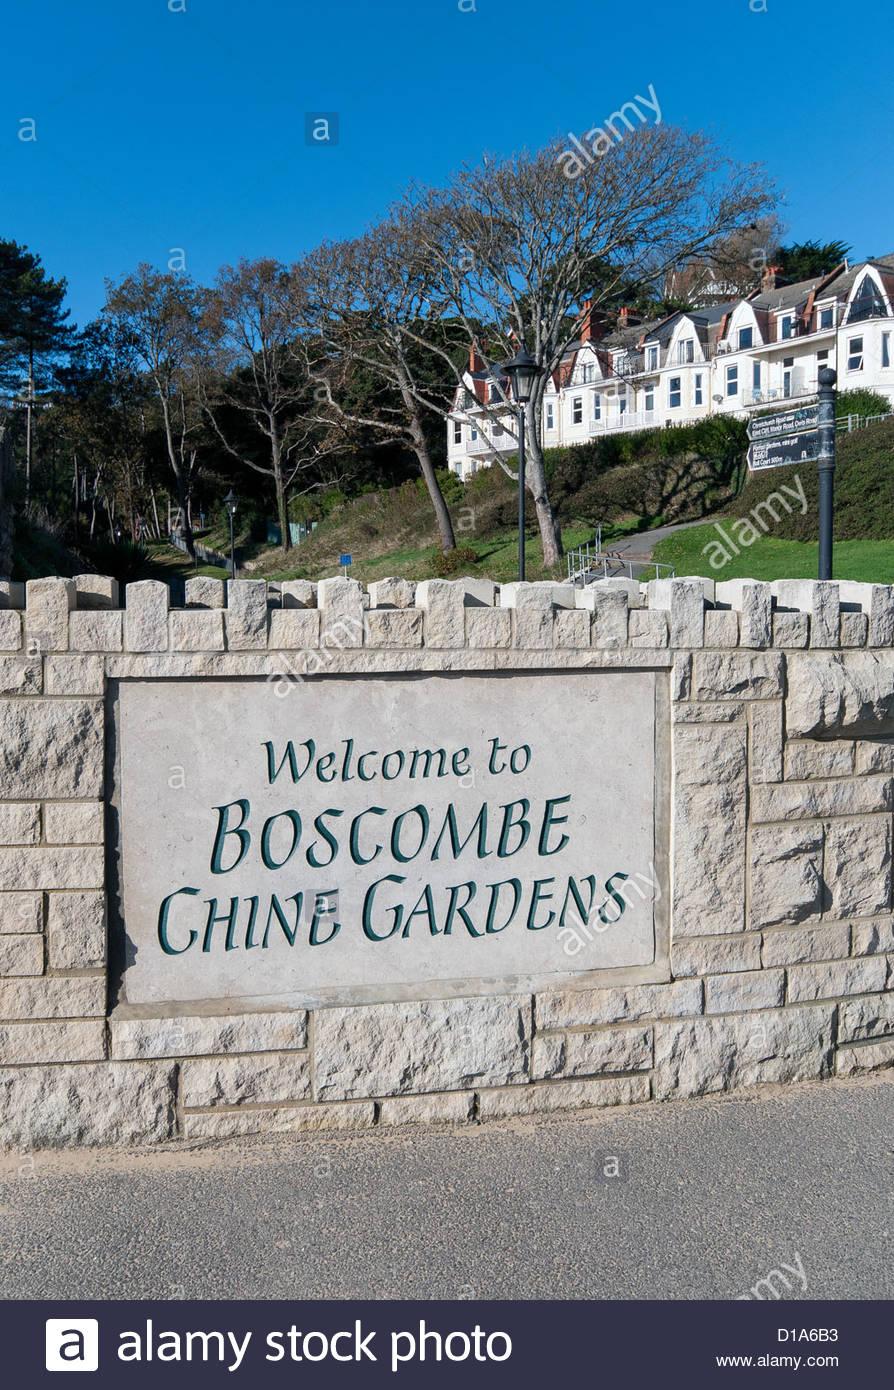 Boscombe Chine Gardens off Boscombe promenade opposite the pier in Dorset England UK - Stock Image